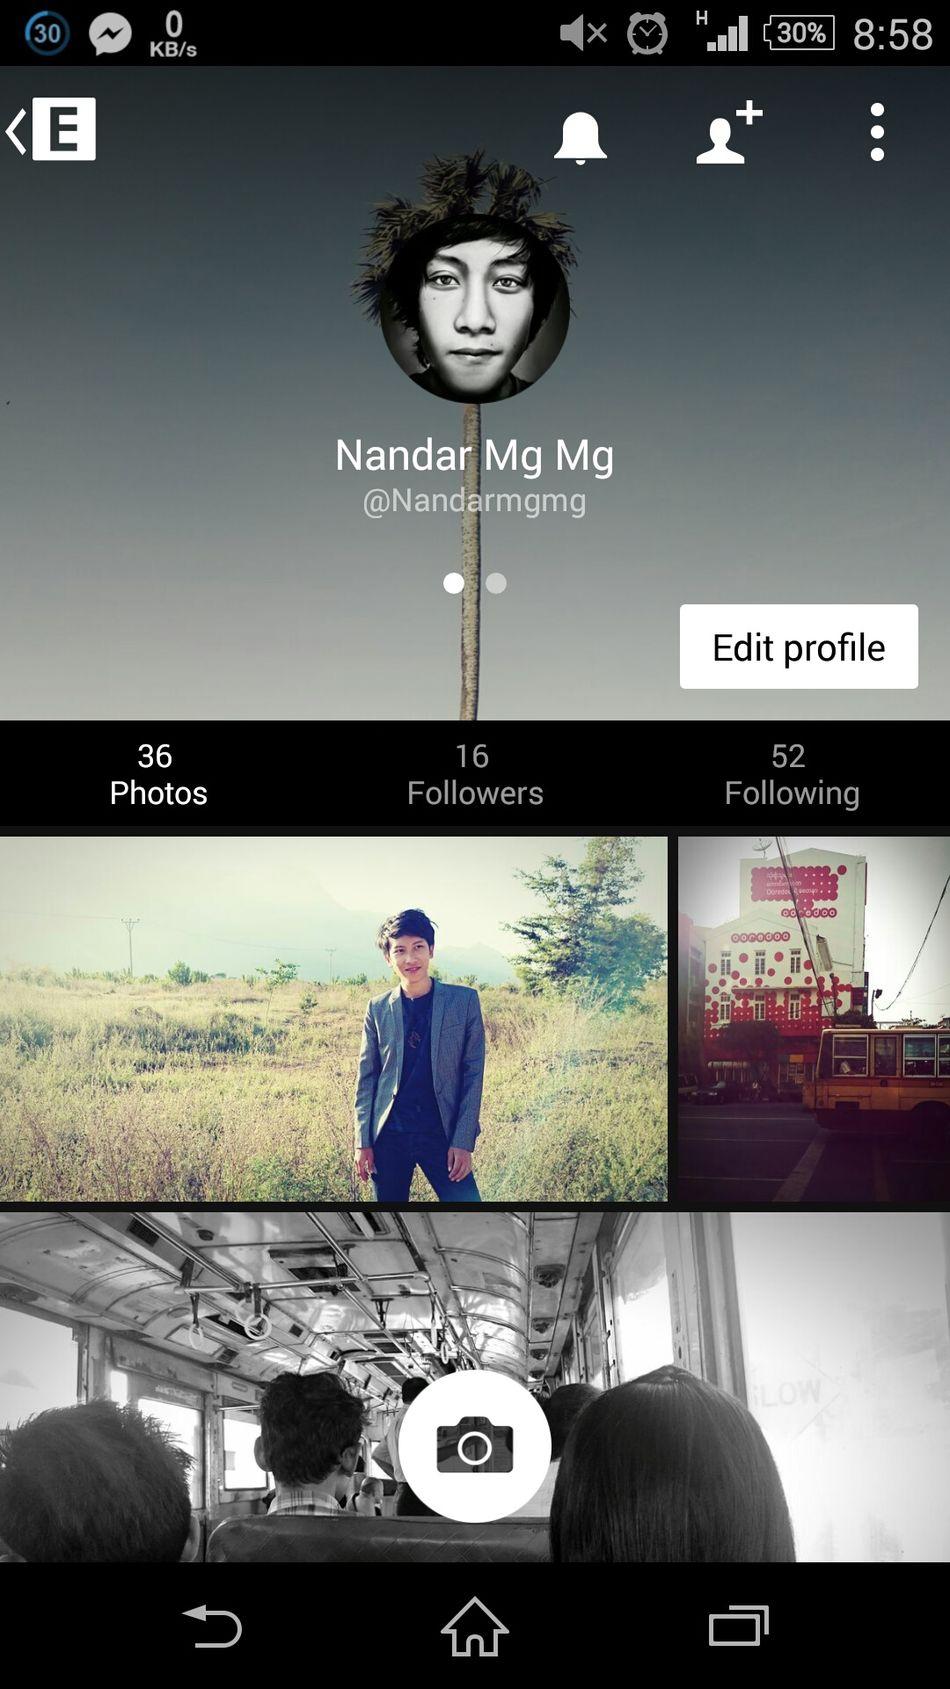 Profile EyeEm Eyeem Profile Creative Idea Profile Picture Hi Follow Me Add Me